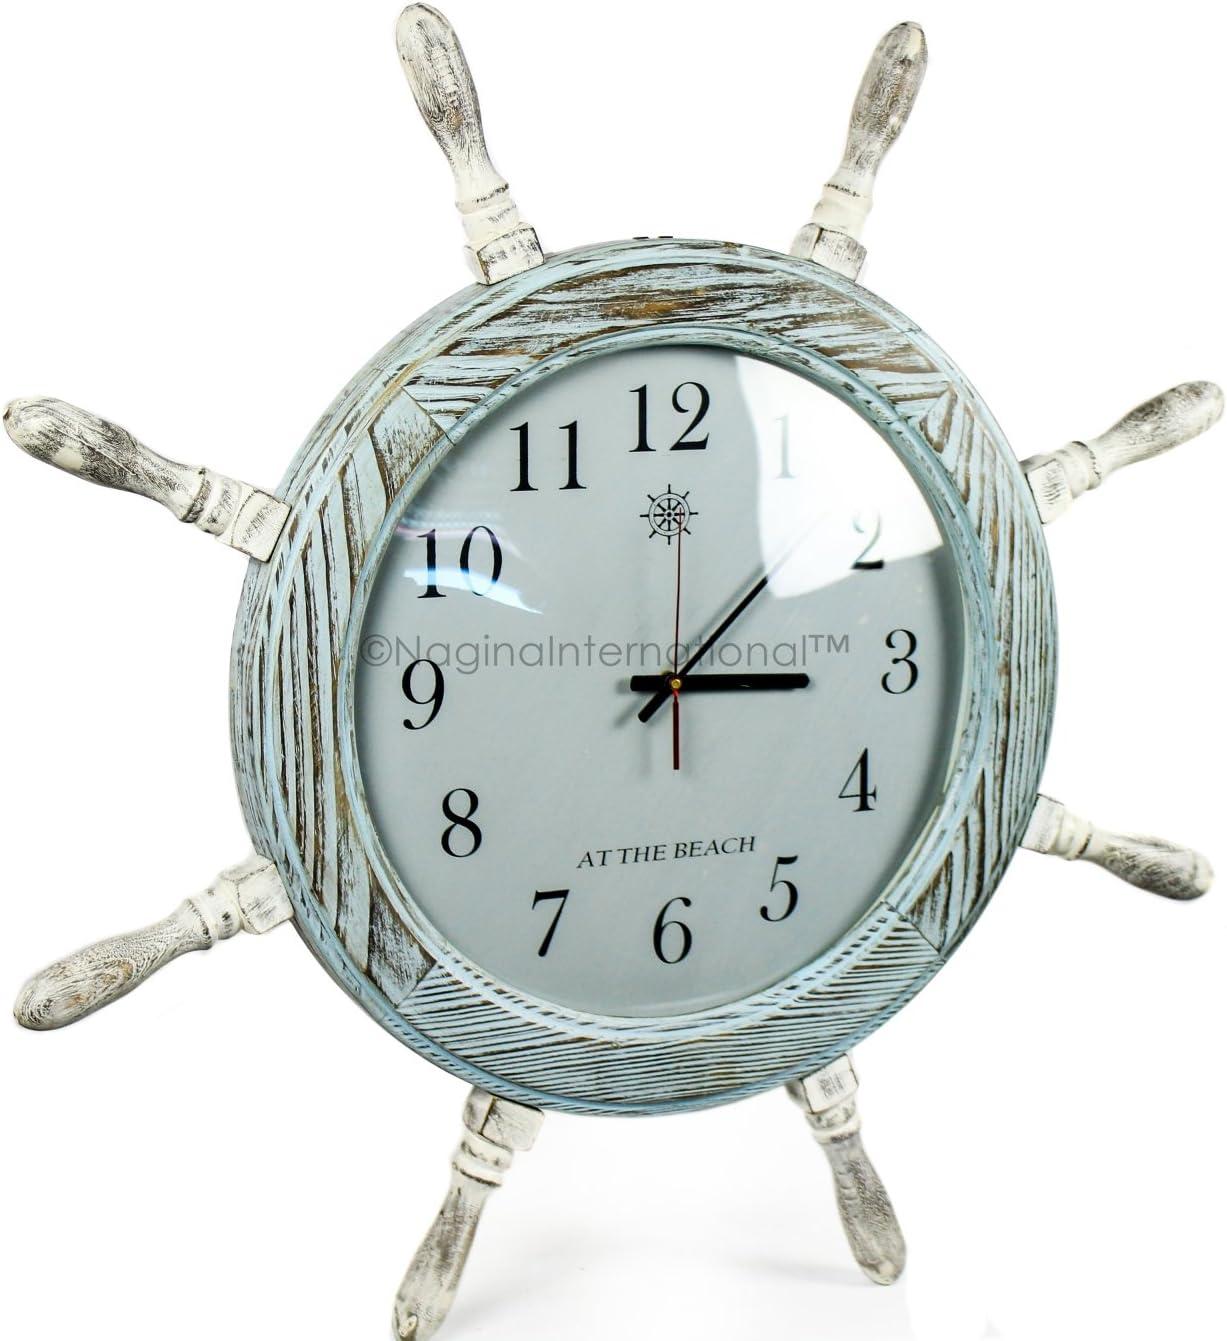 Nagina International 28 Inches Large Premium Pine Wood Nautical Ship Wheel Vintage Clock | Pirate's Gift | Beach Home Decor